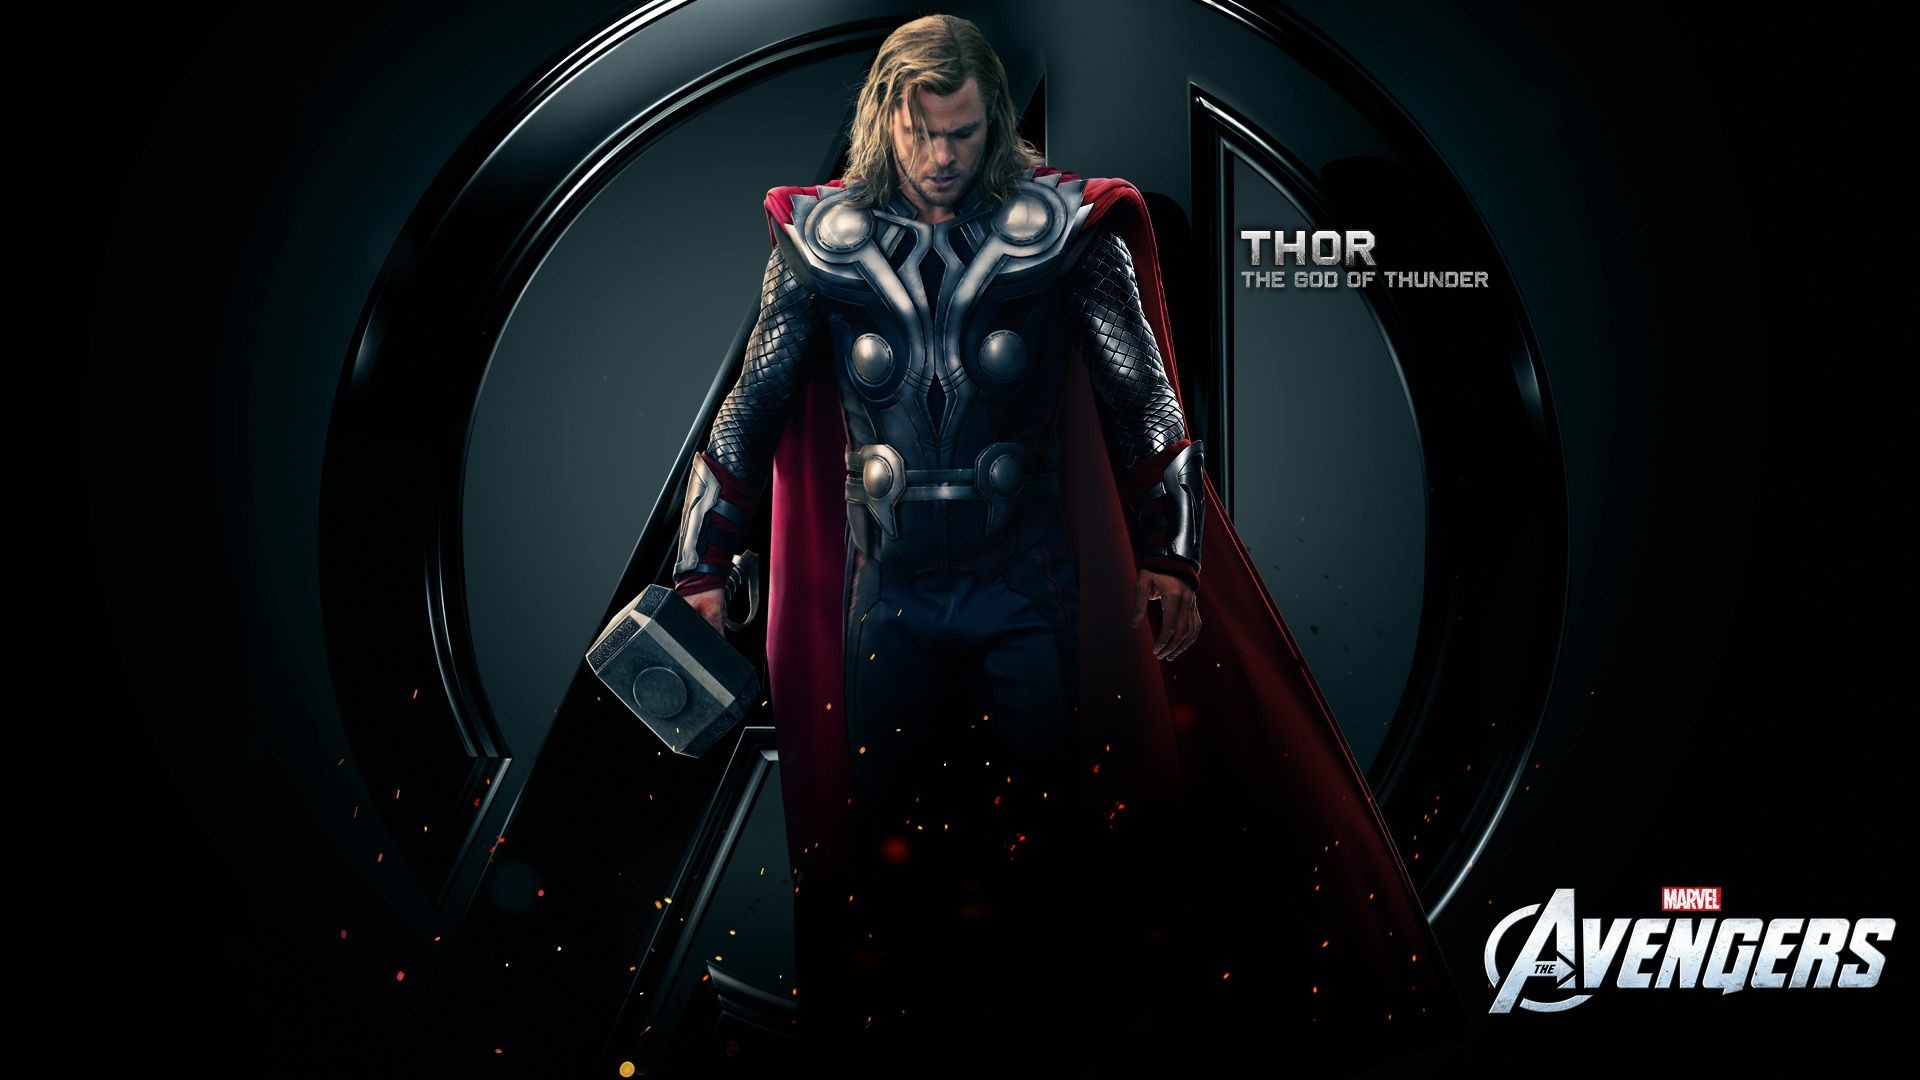 Res: 1920x1080, Thor The God of Thunder WallPaper HD - http://imashon.com/